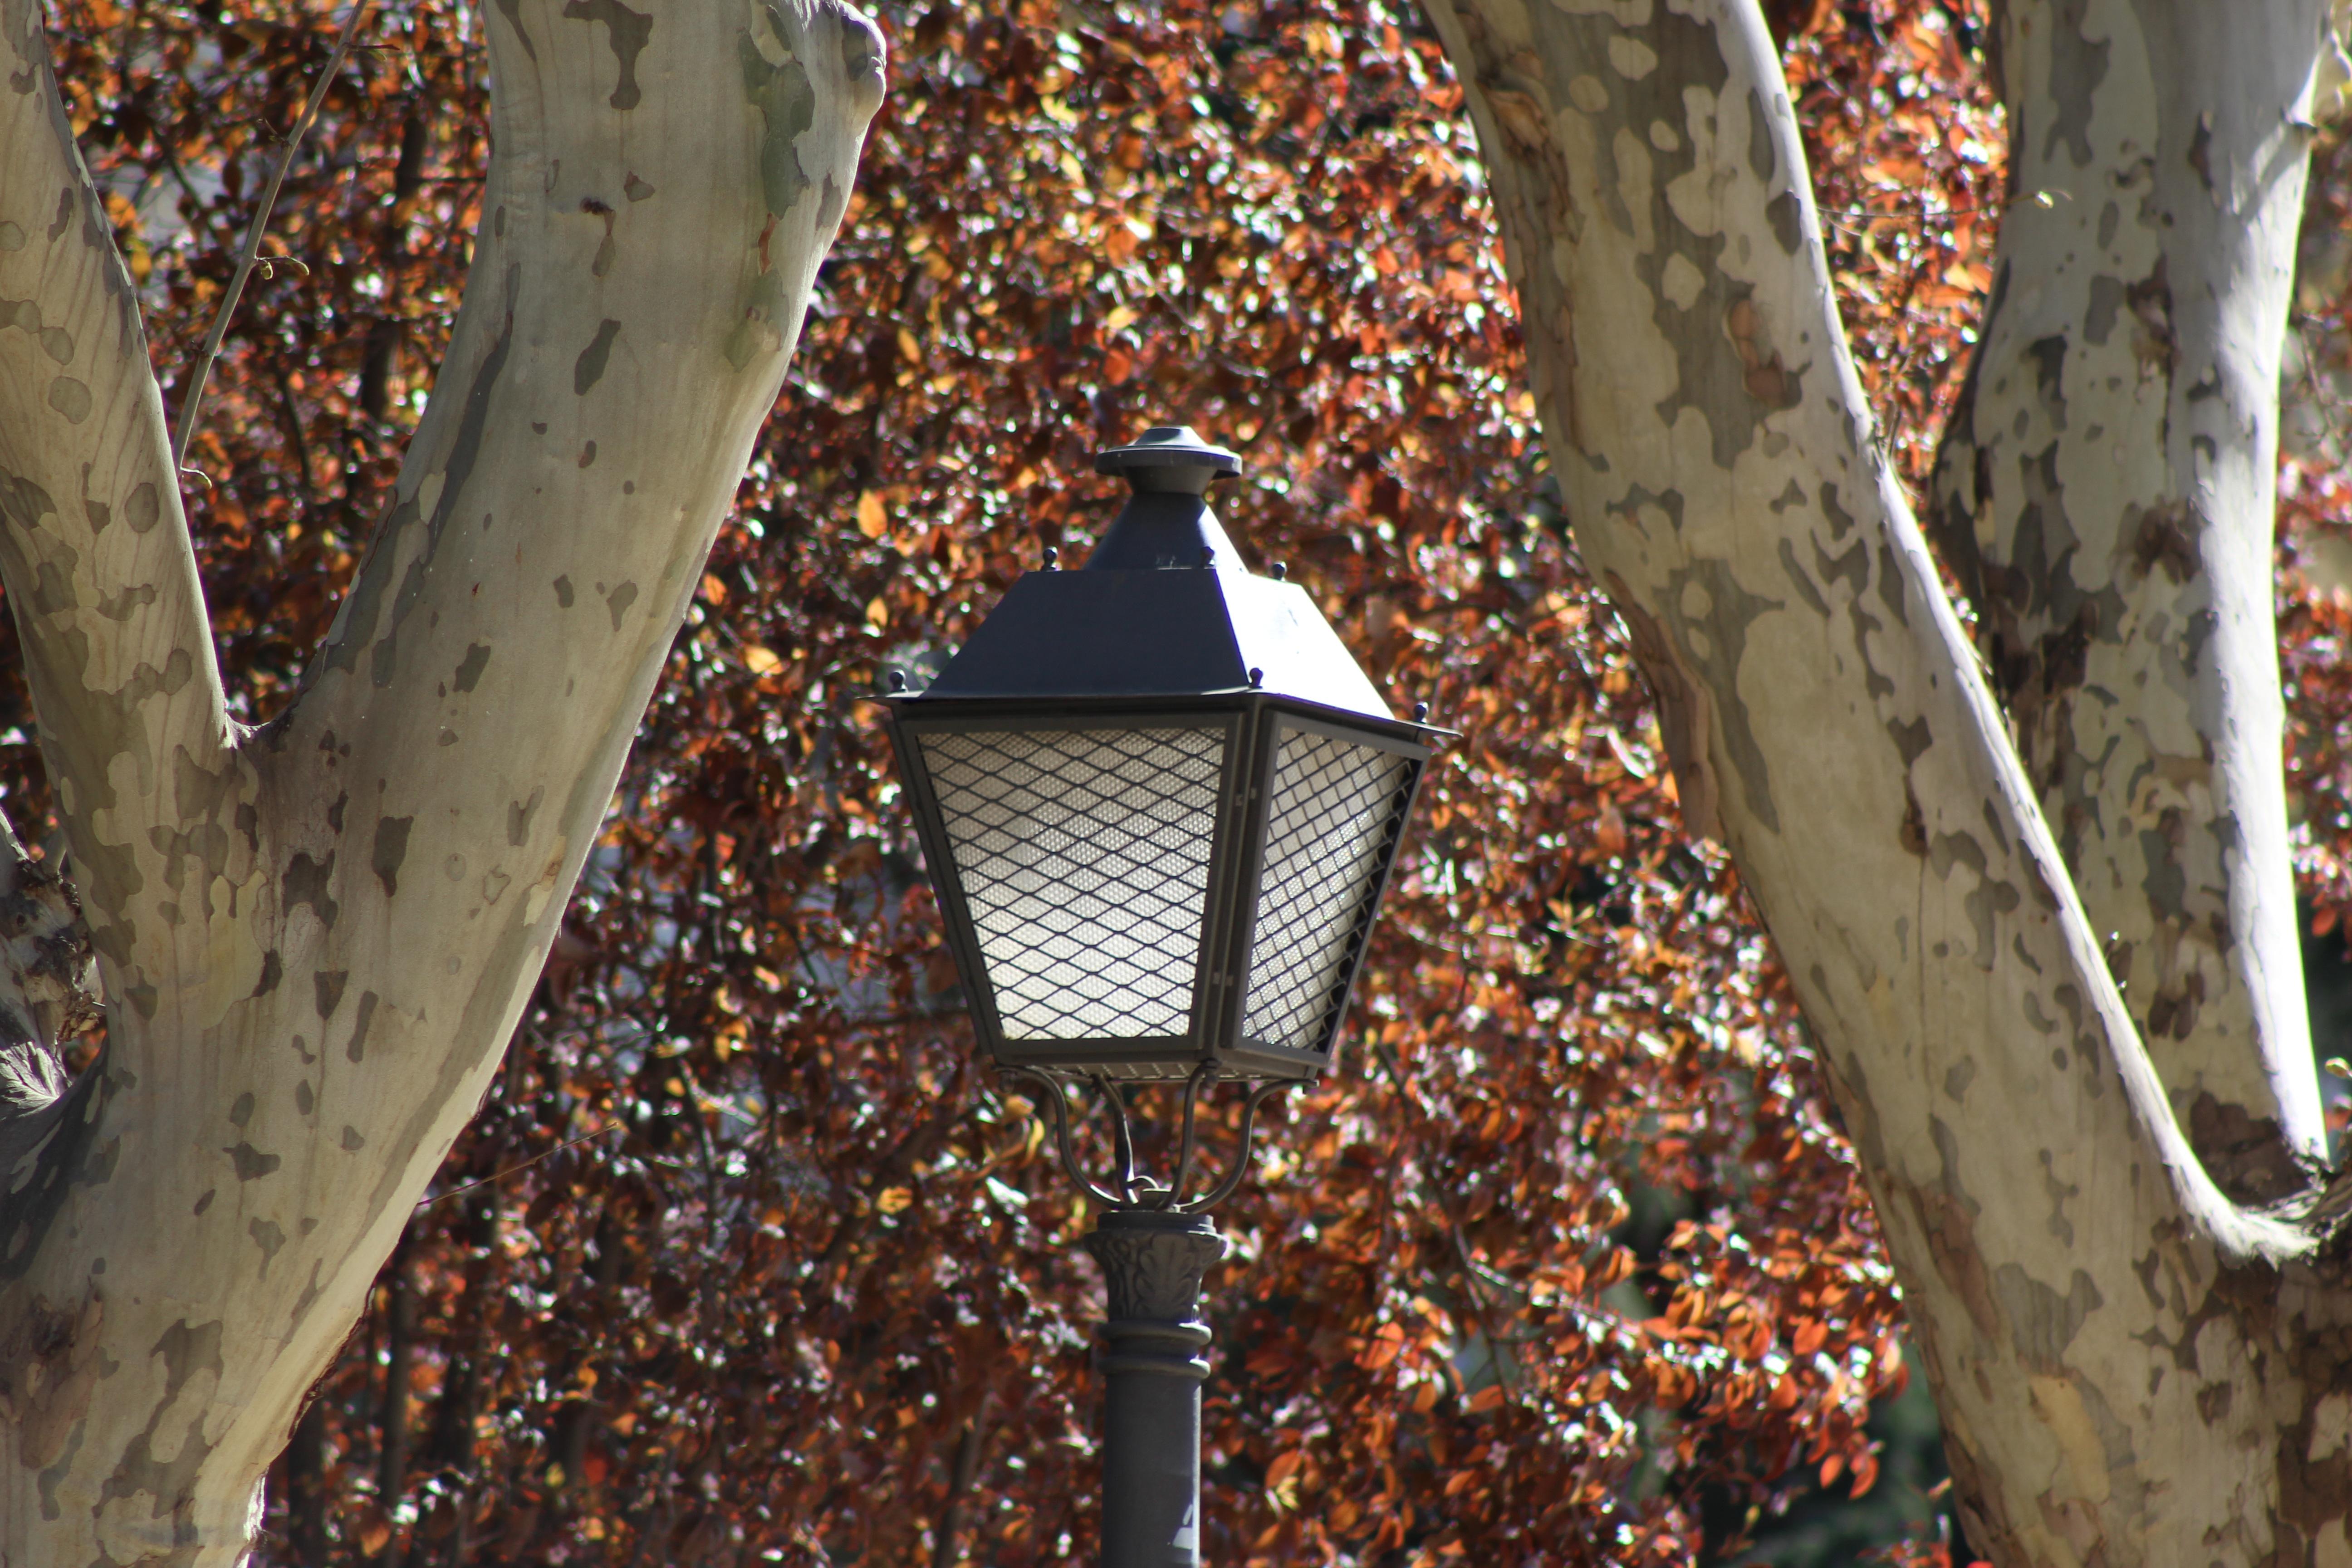 дерево фонарь картинки представляет